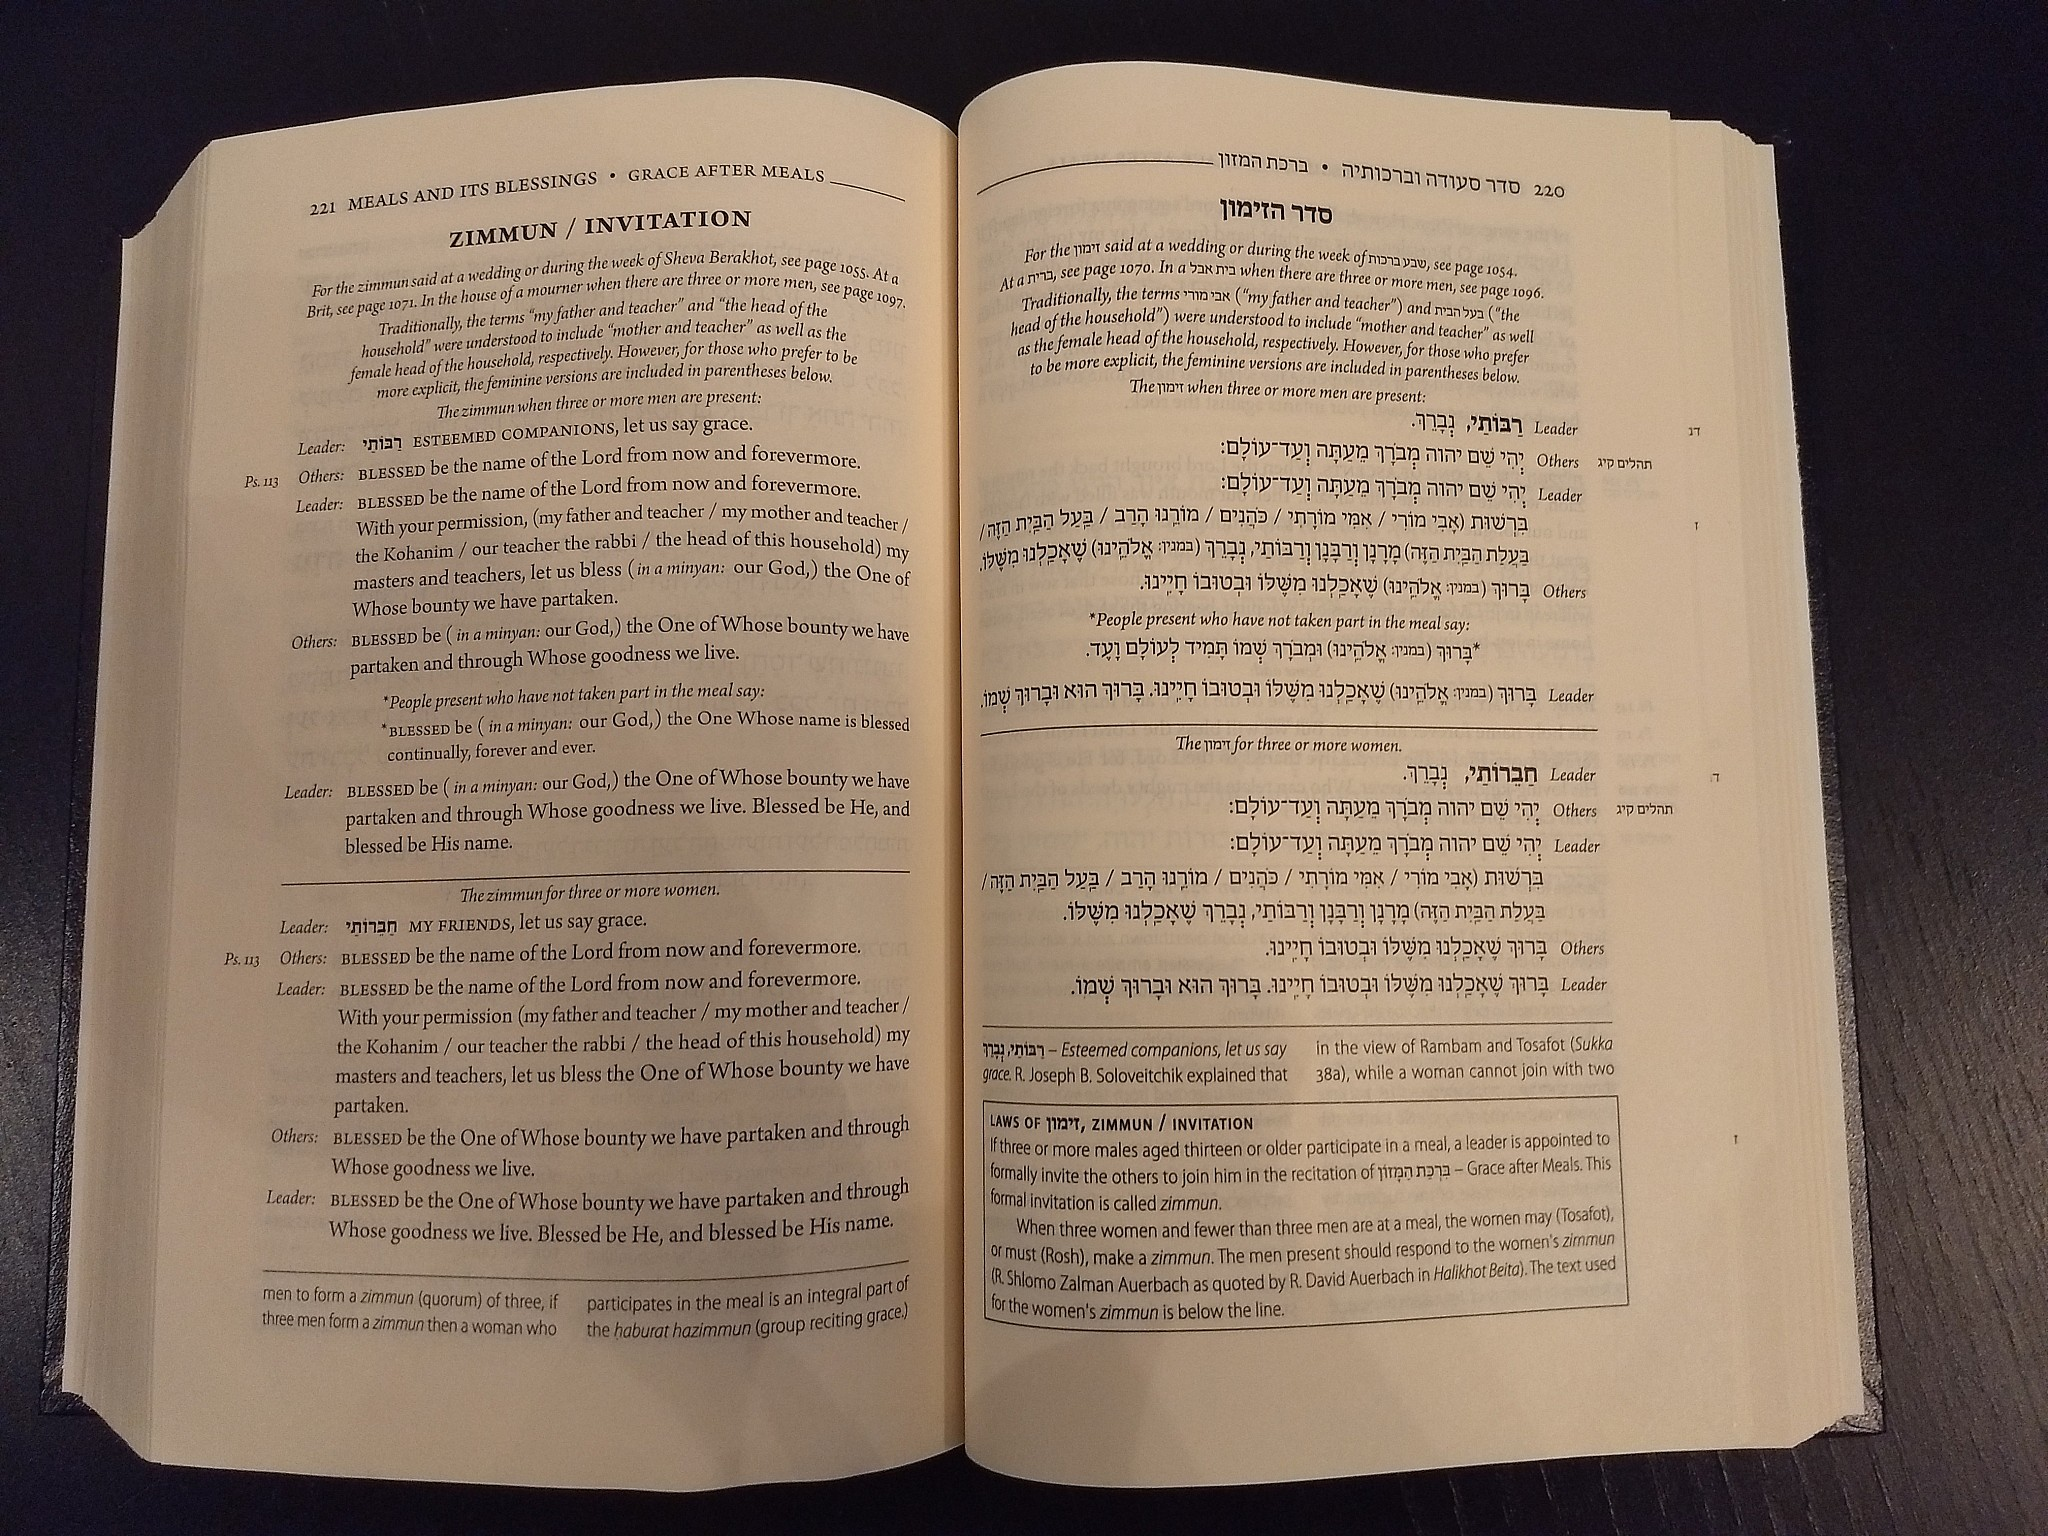 Will modernized texts replace ArtScroll prayer books in